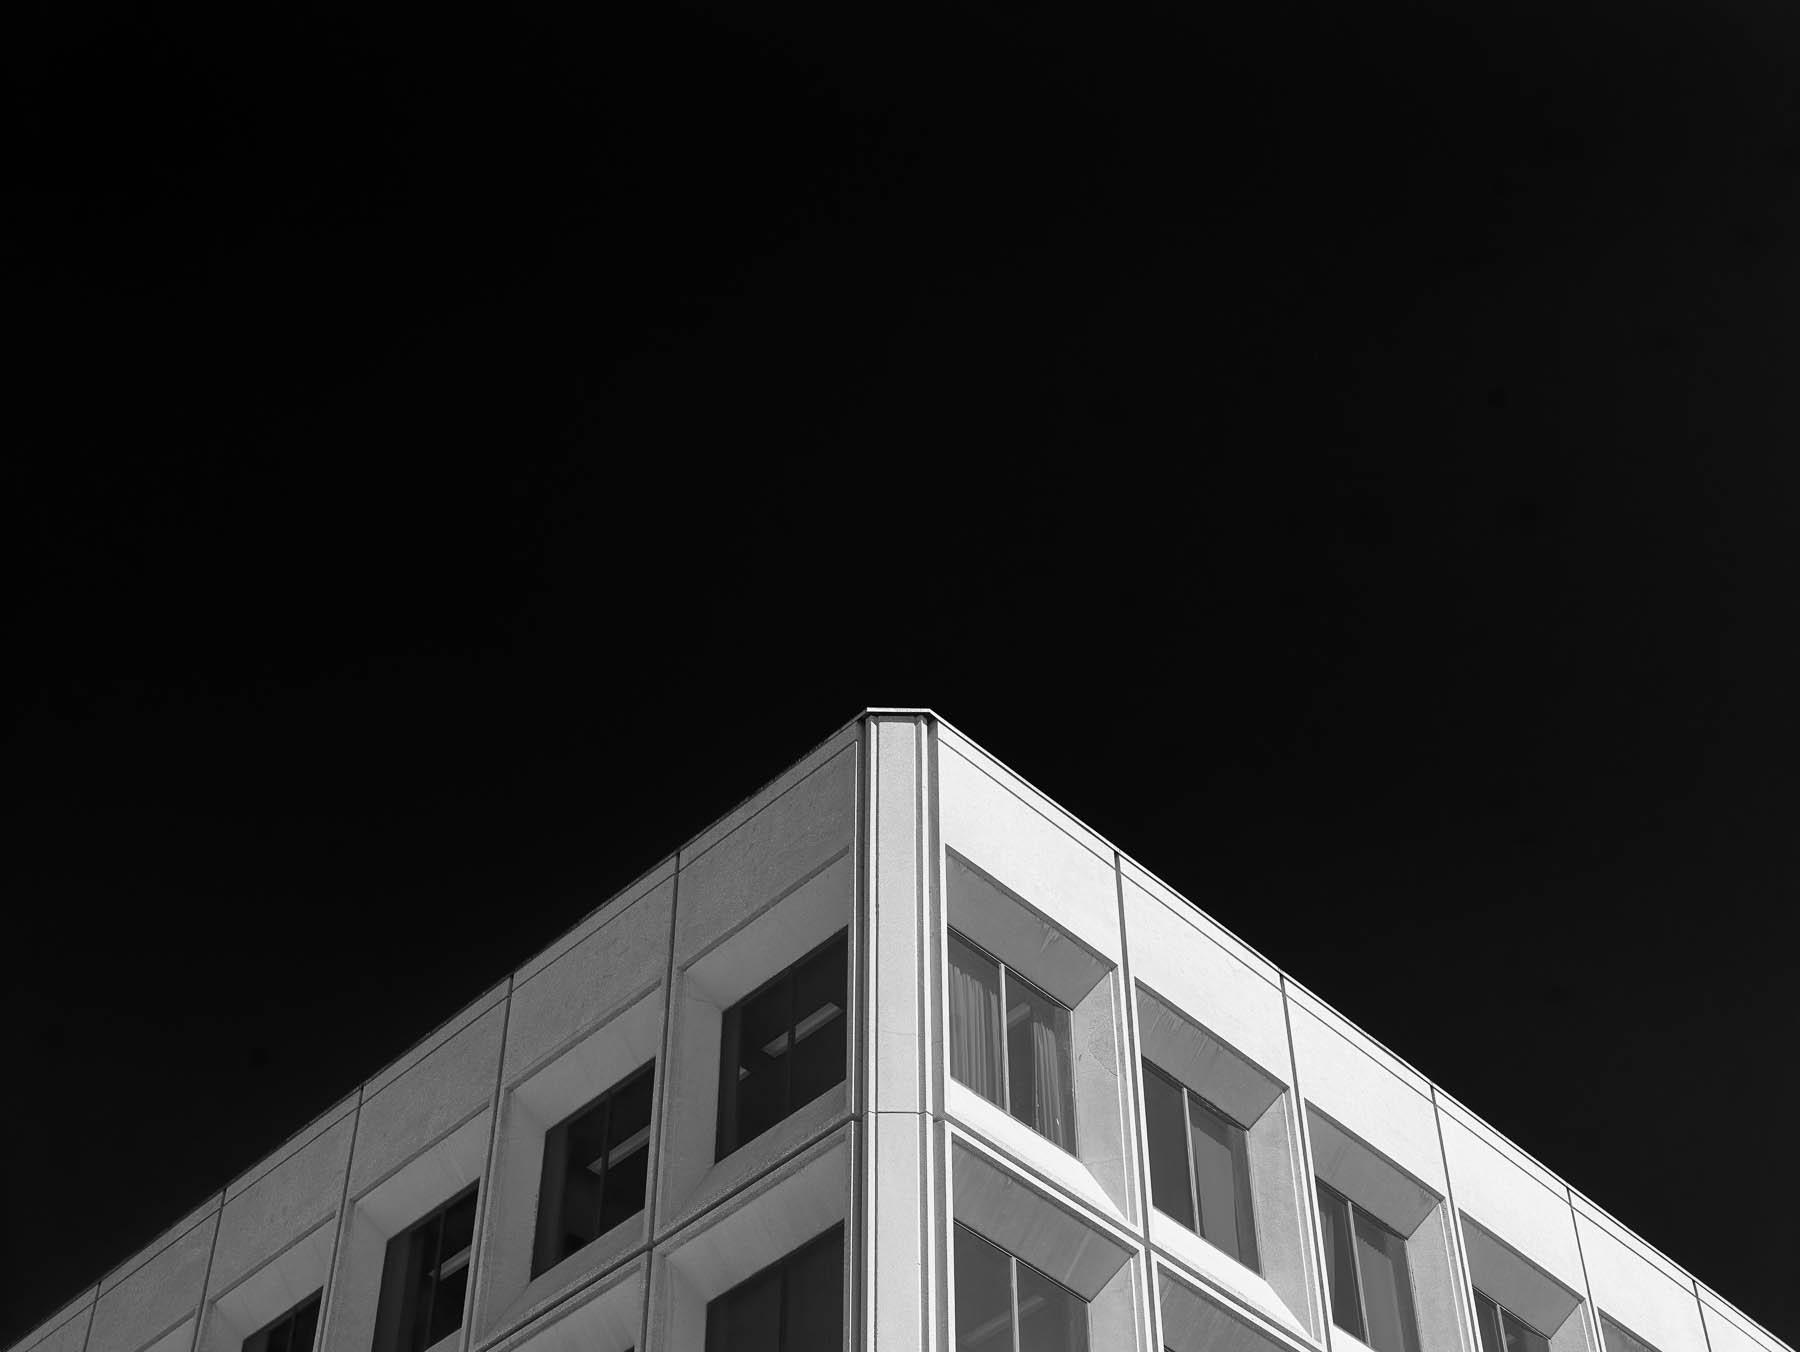 United States Department of Energy, The Forrestal Building, Washington DC